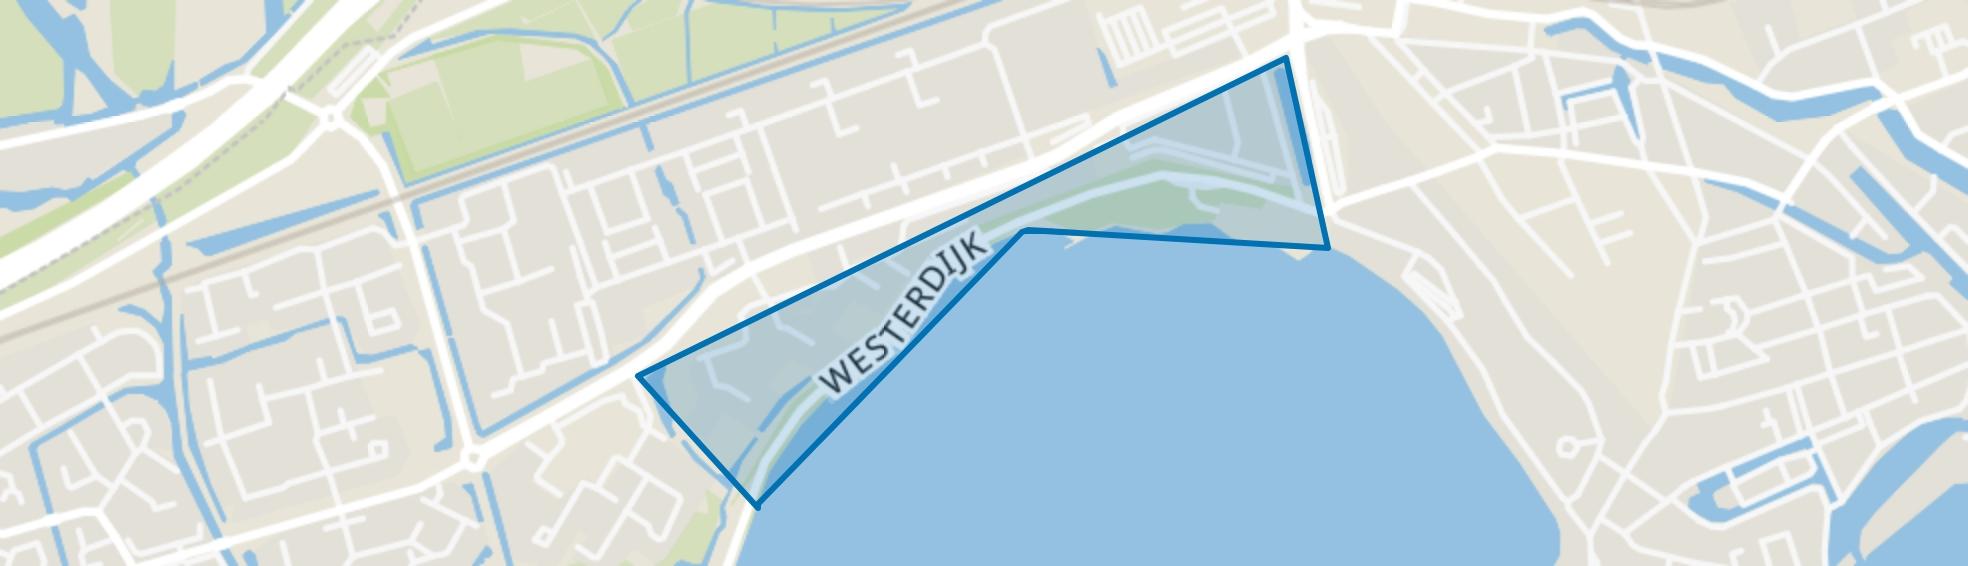 Grote Waal - Buurt 13 00, Hoorn (NH) map